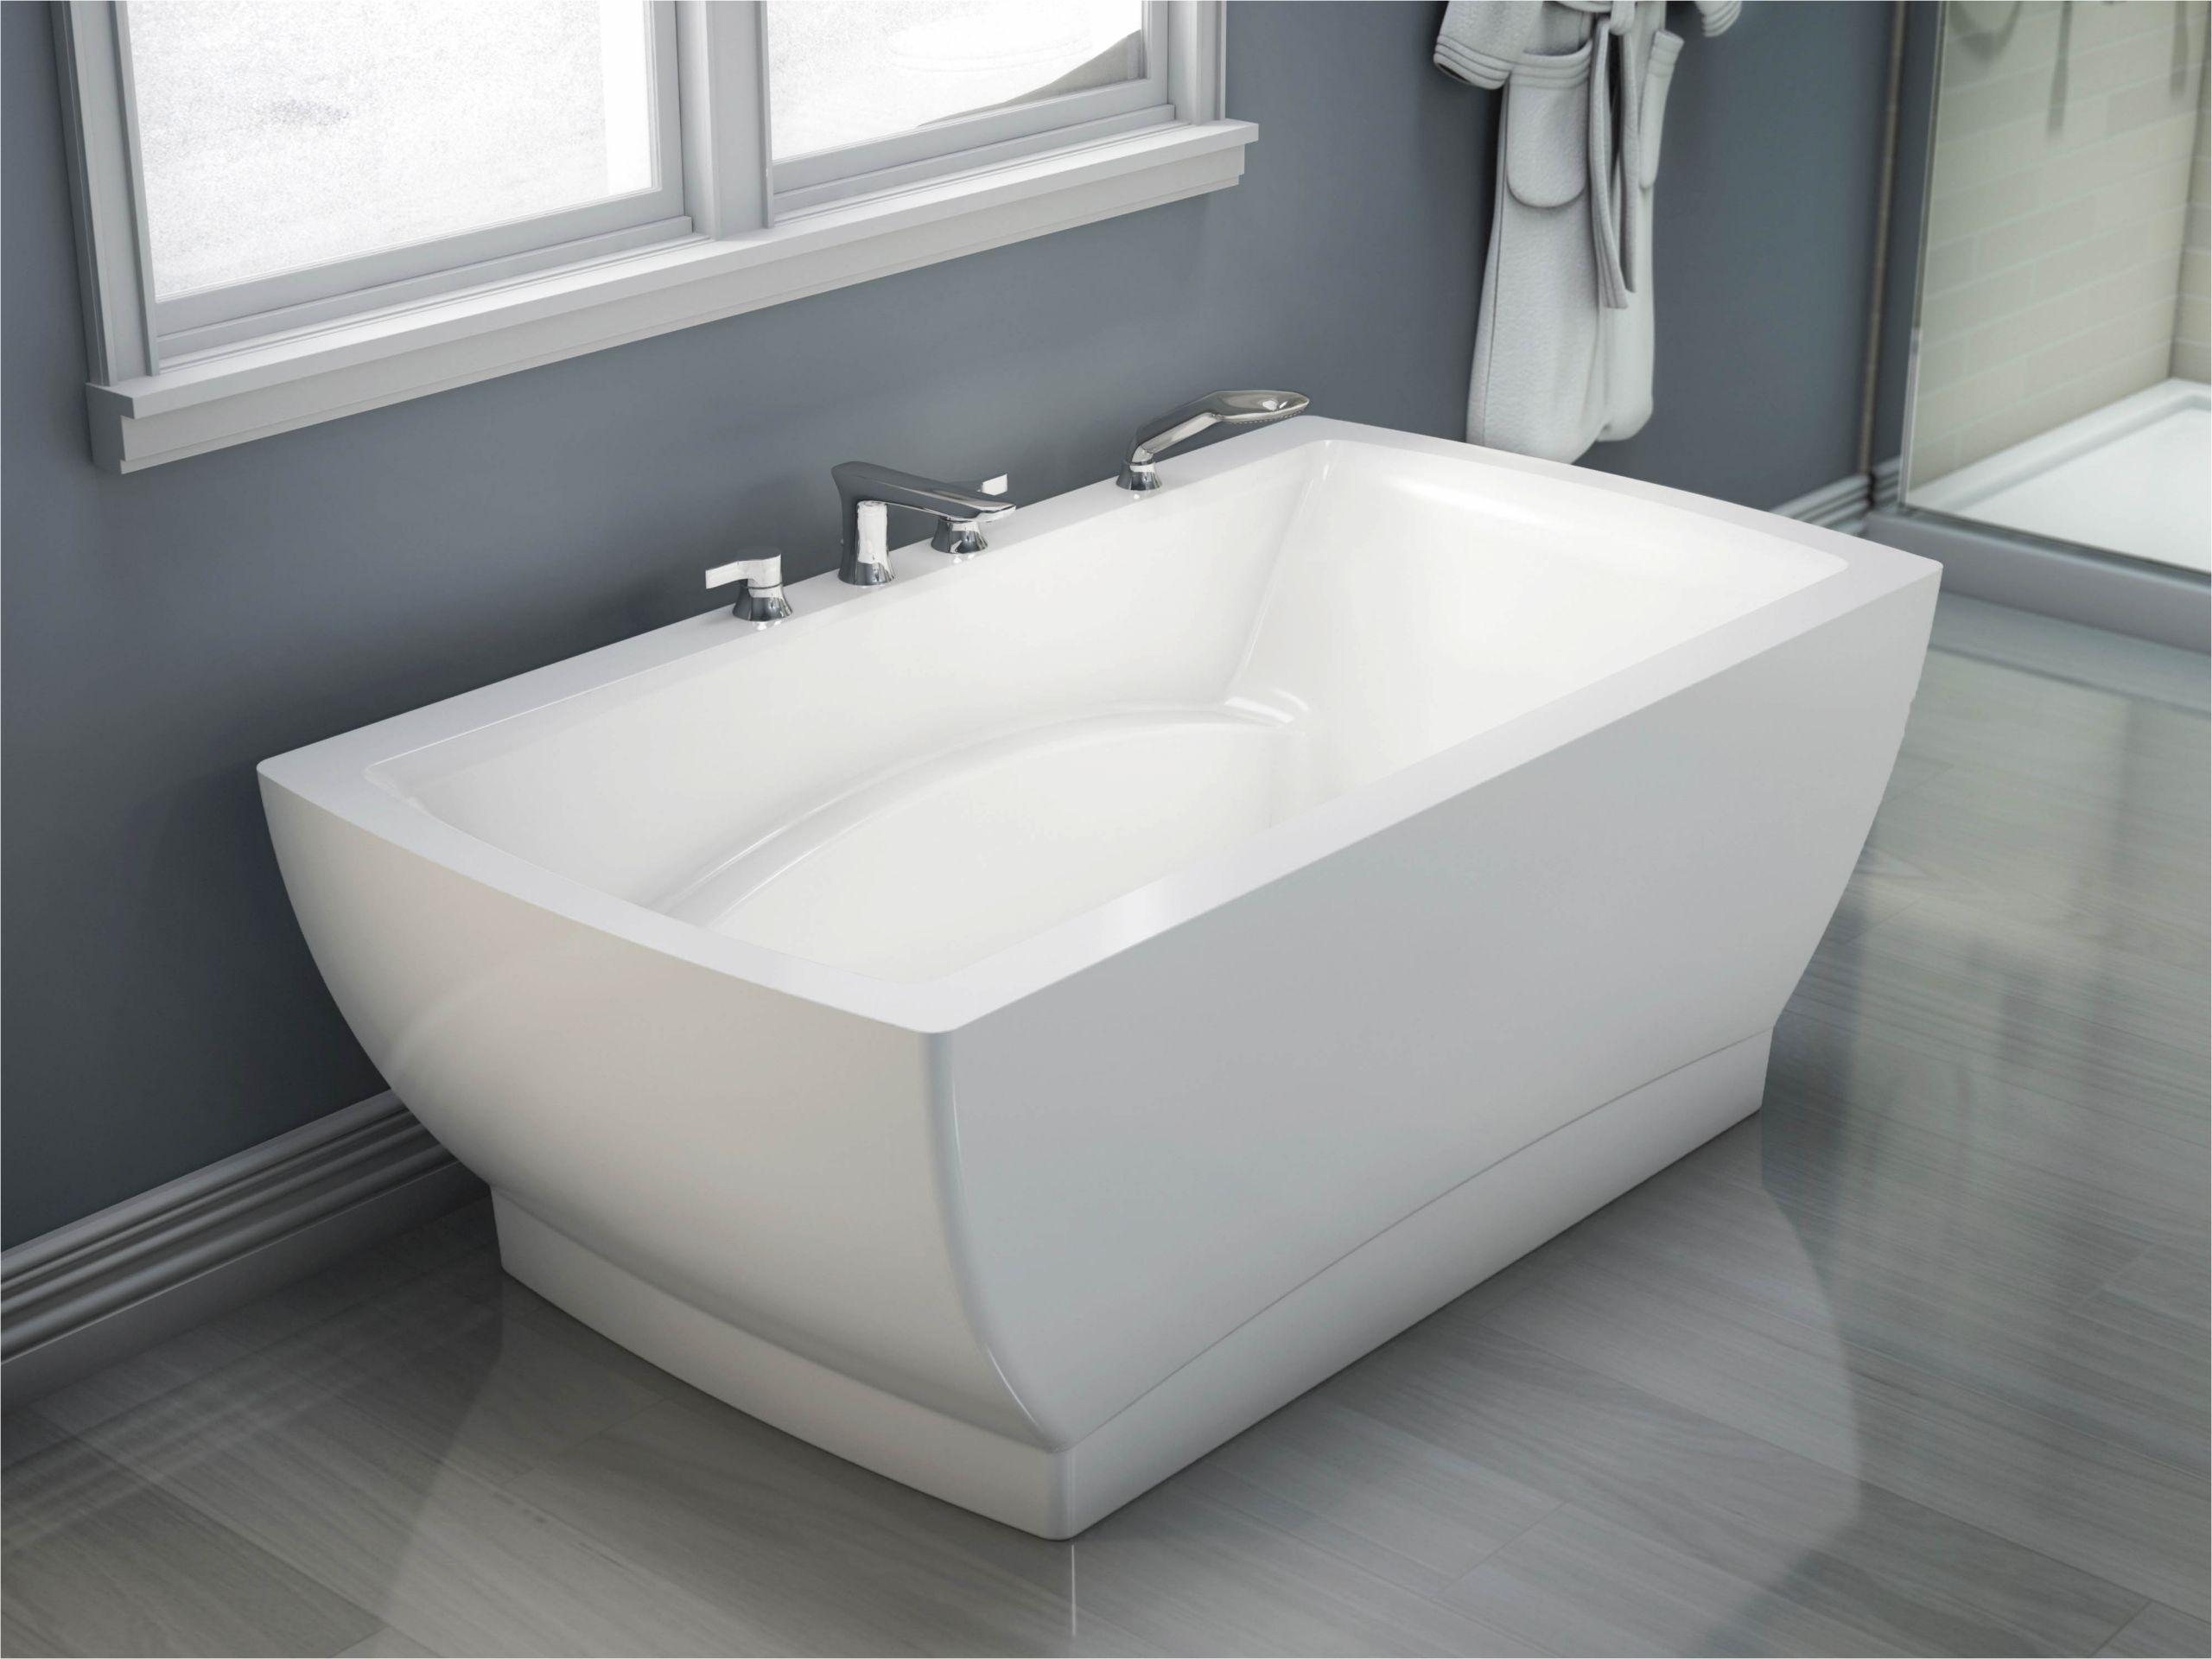 Bathtubs for Sale Edmonton Believef – Edmonton Water Works Bathroom Renovations